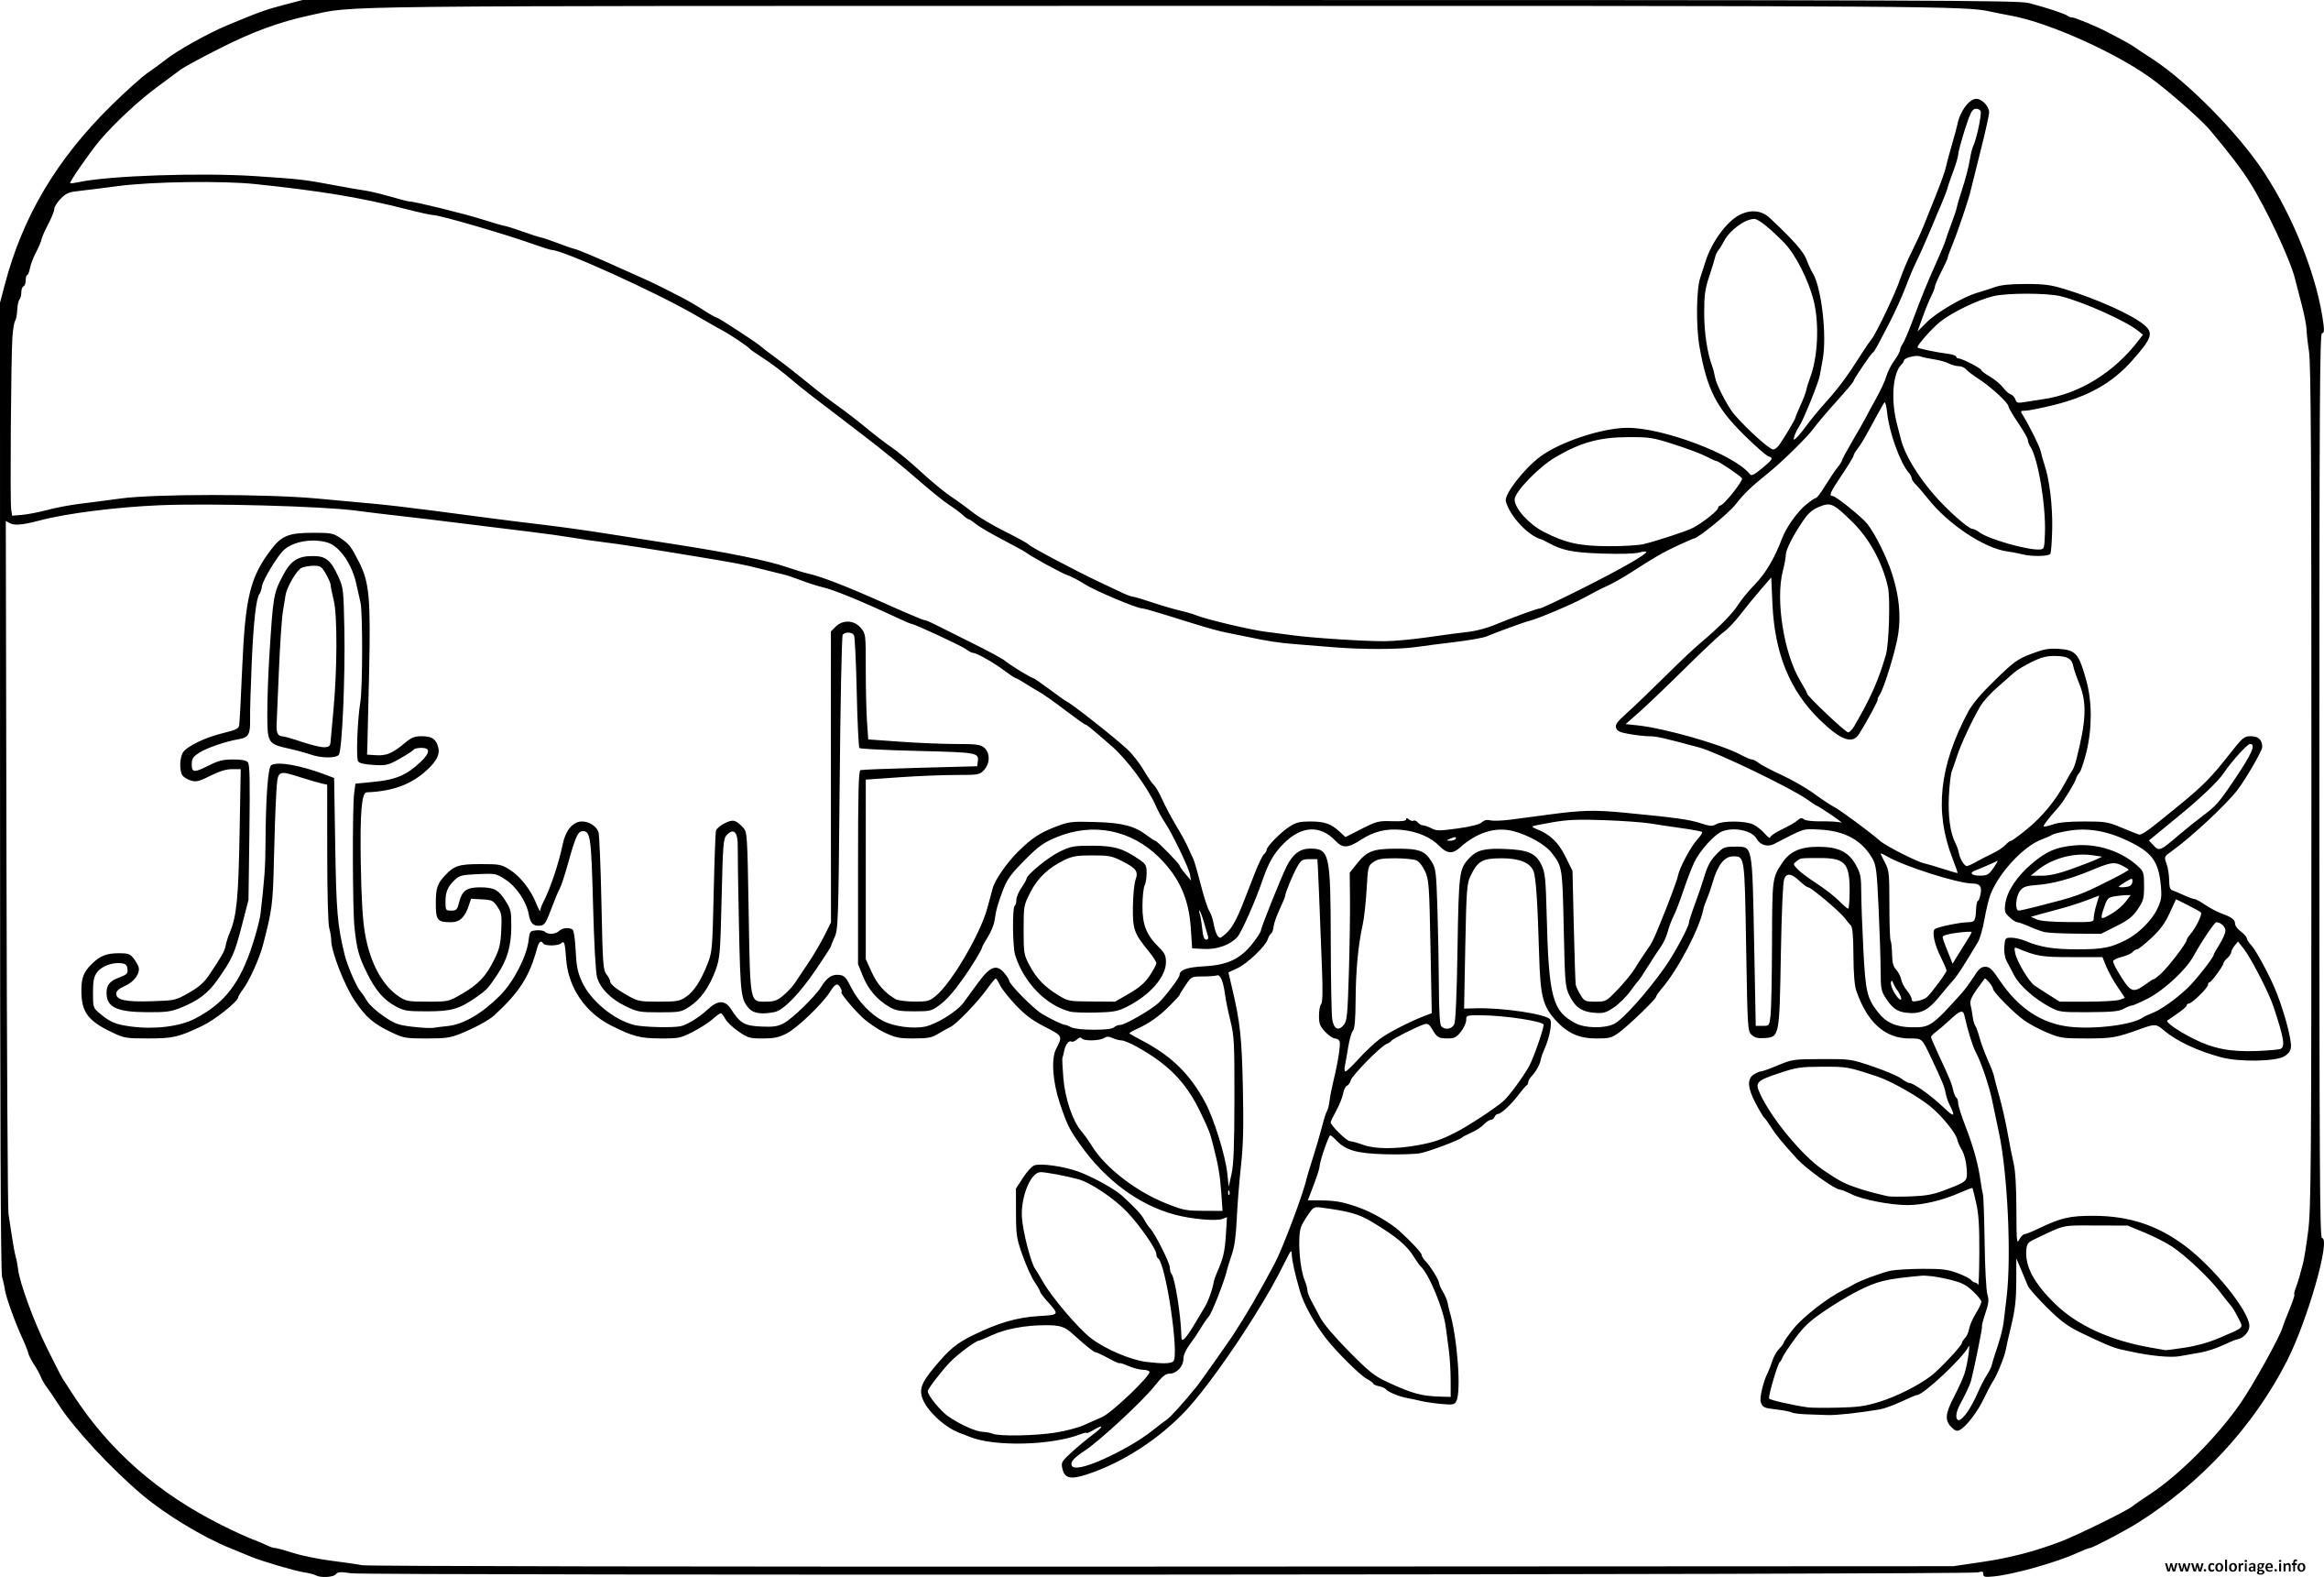 Coloriage Arbre Dautomne Maternelle.Coloriage Automne Arbre Texte Dessin